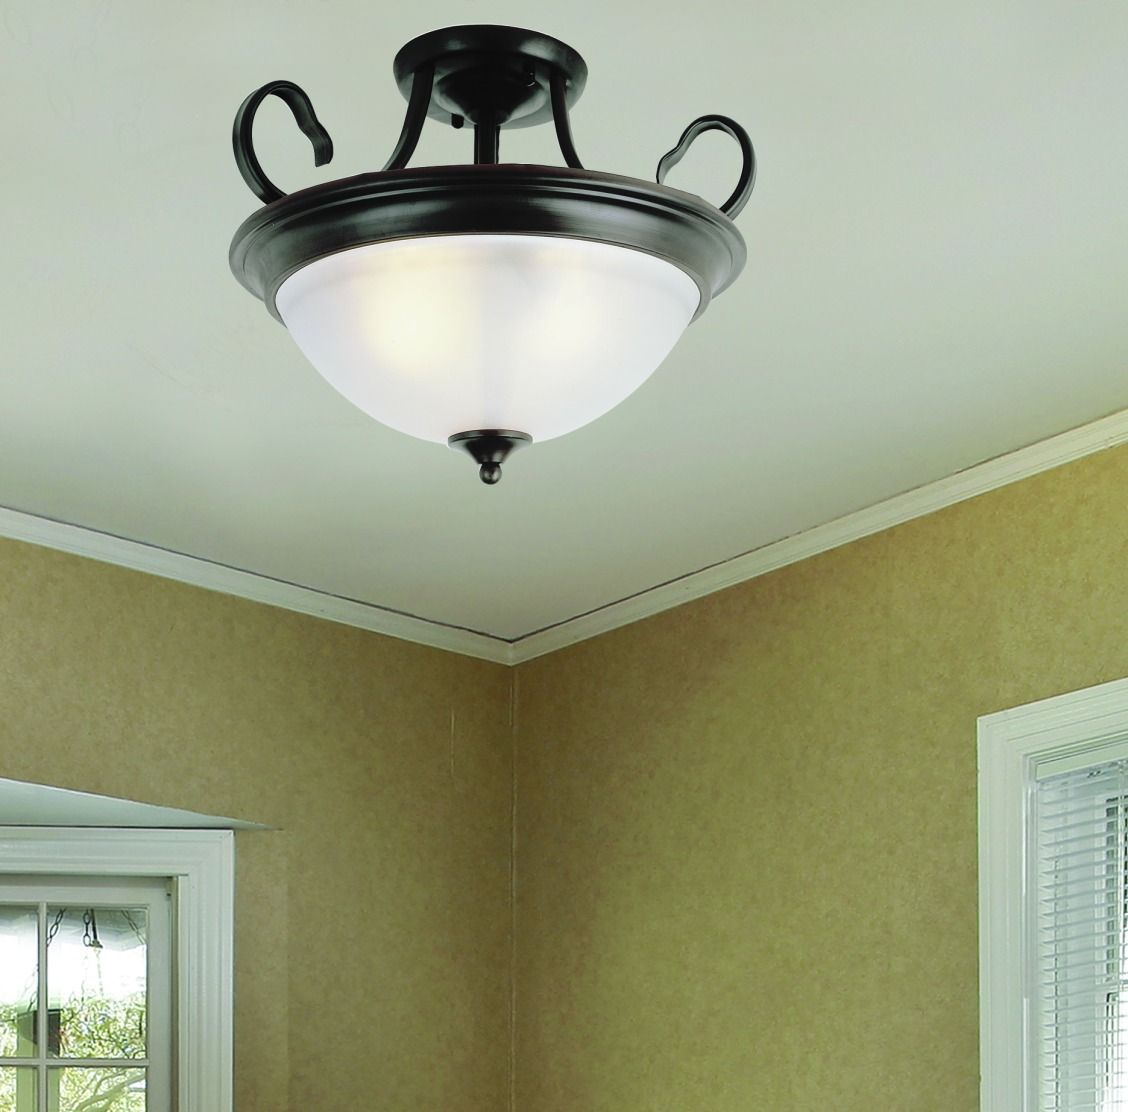 Patriot lighting arabella semi flush ceiling light with oil rubbed